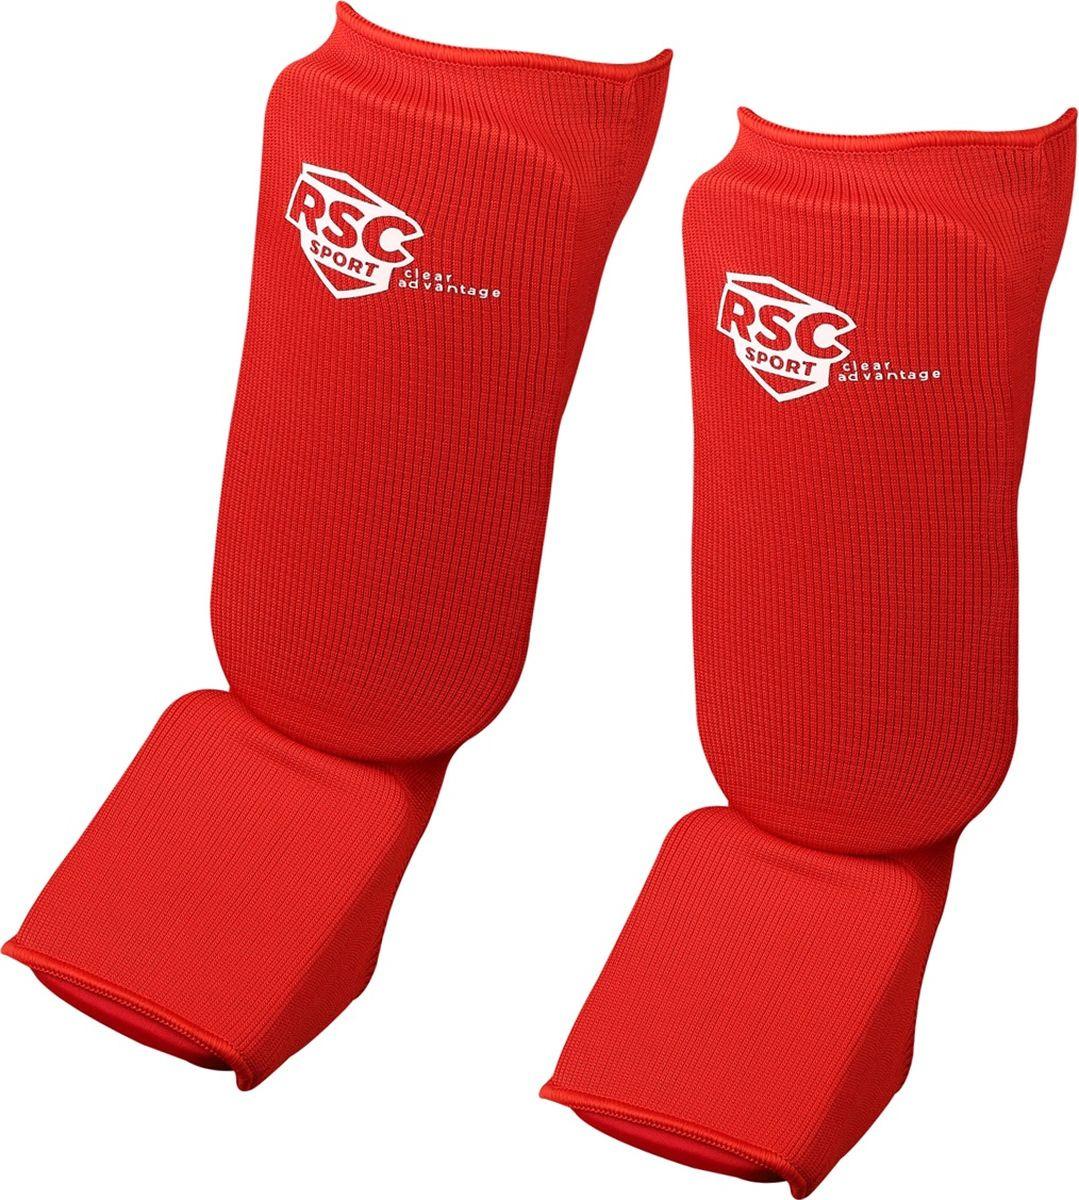 Защита голеностопа RSC, RSC002, красный, размер M adidas защита голени pu shin guard